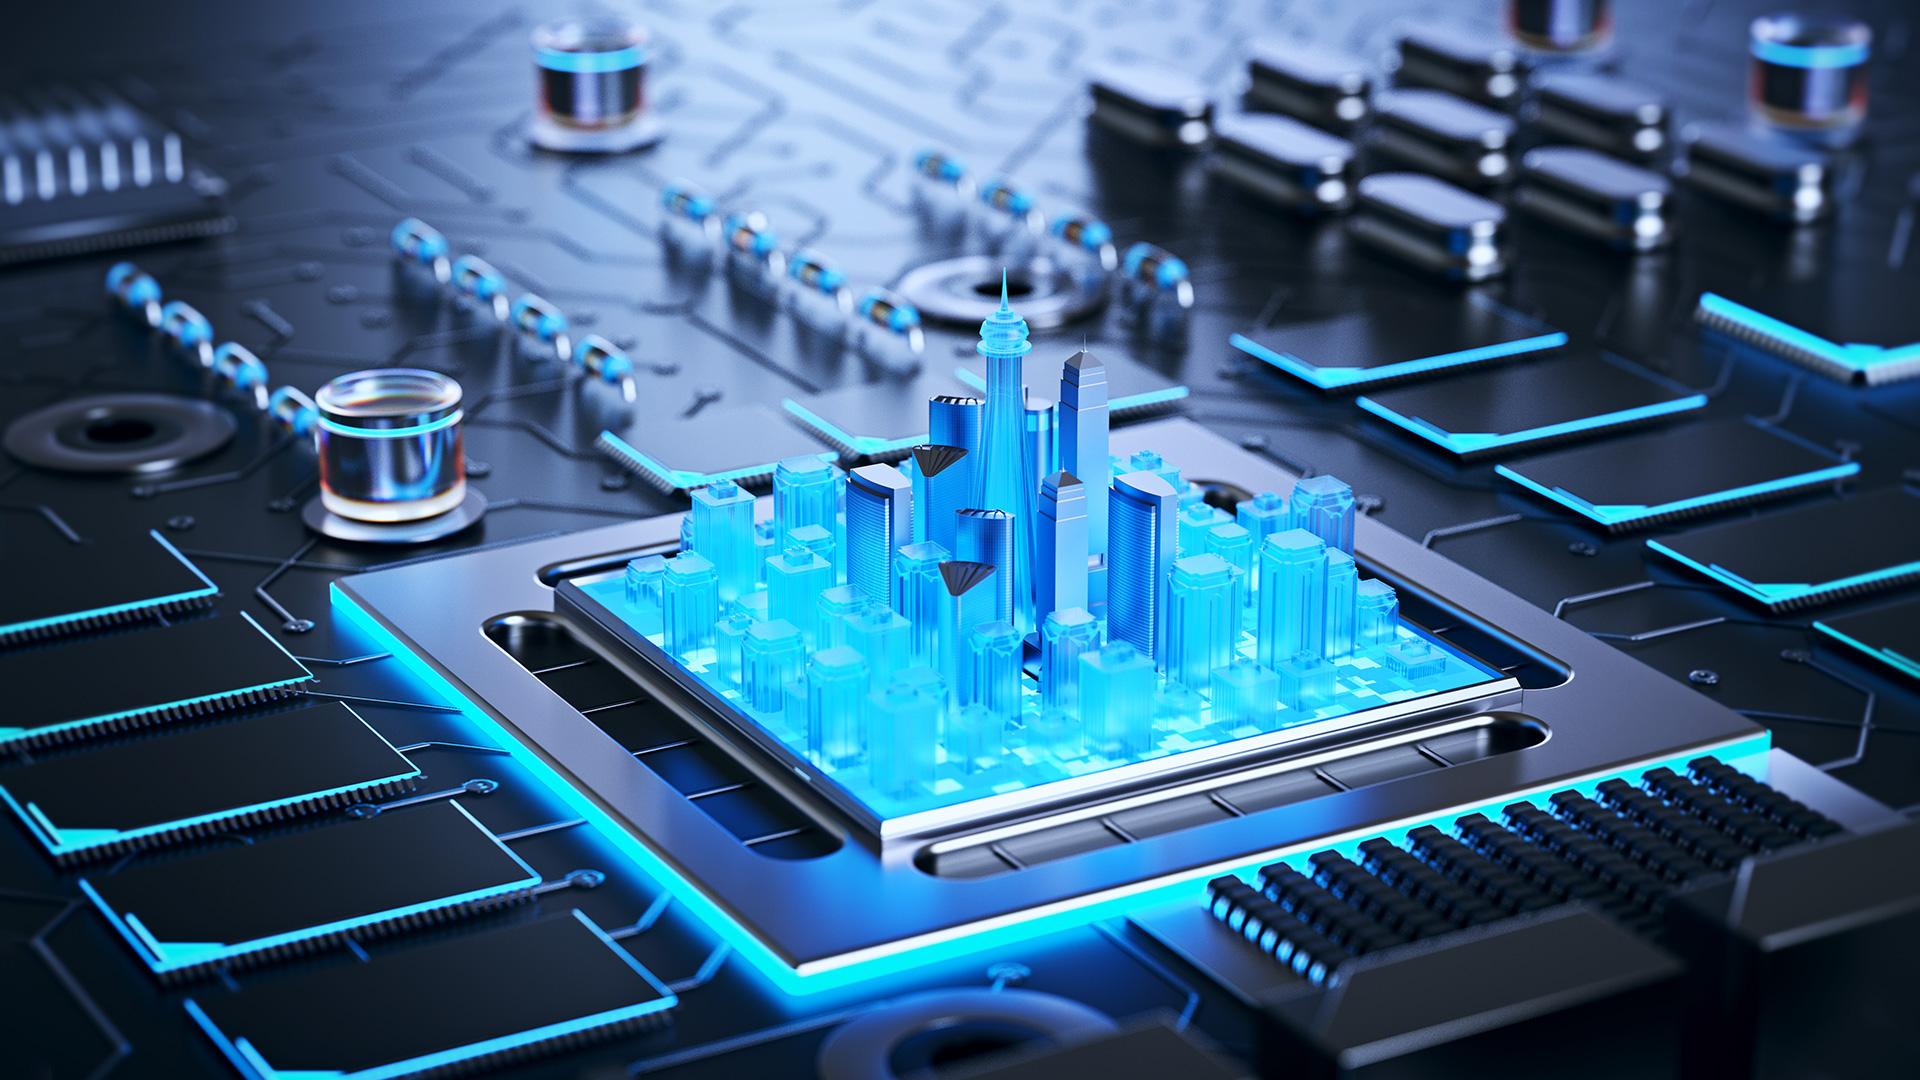 The Future of Urban Planning AKA Smart Cities | Stambol Studios